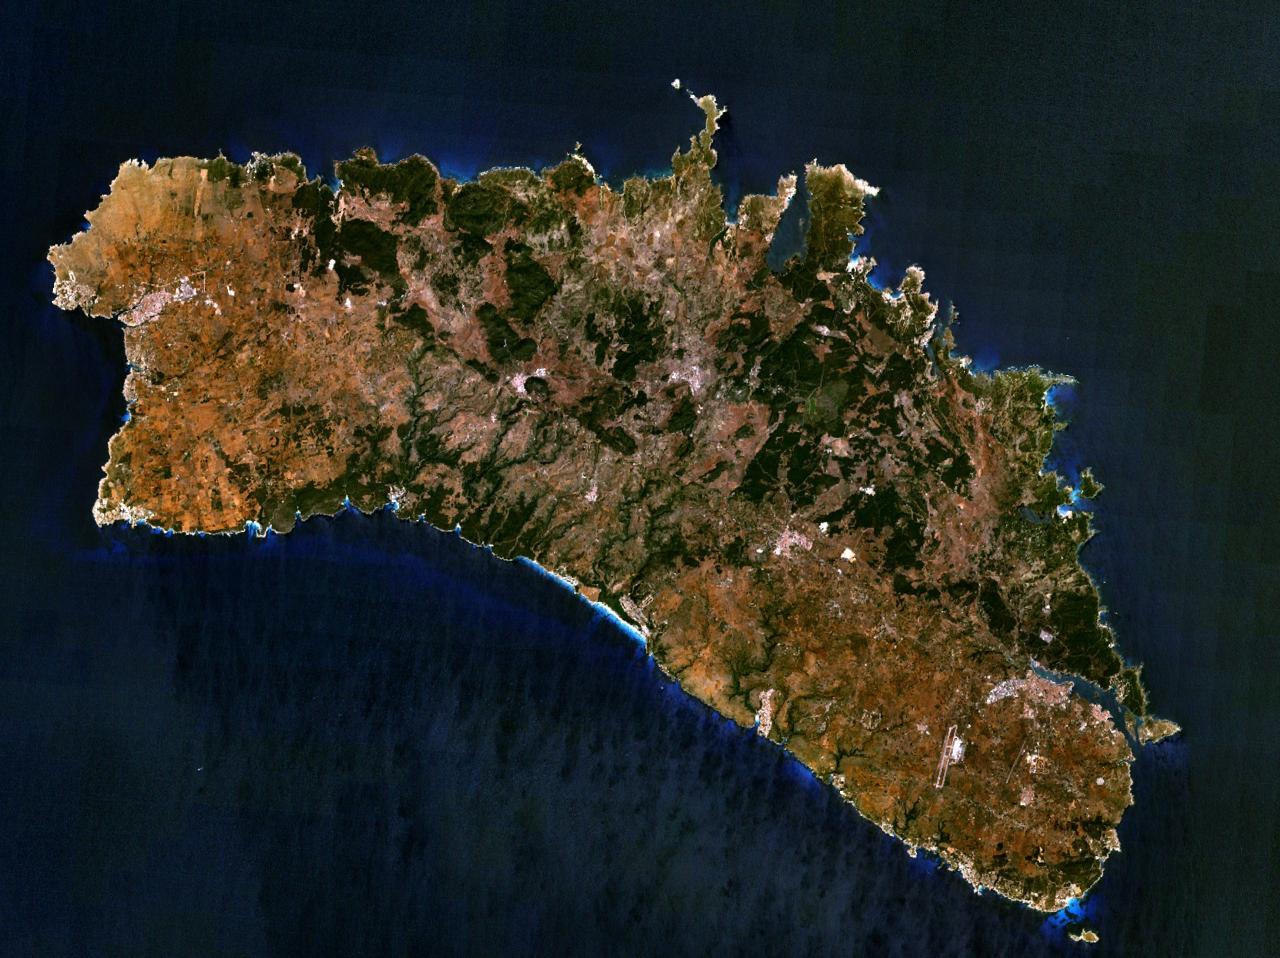 http://3.bp.blogspot.com/_dTy5rYdKeq0/TH5VqUP54CI/AAAAAAAABgA/bREzjSatlfE/s1600/Menorca.jpg